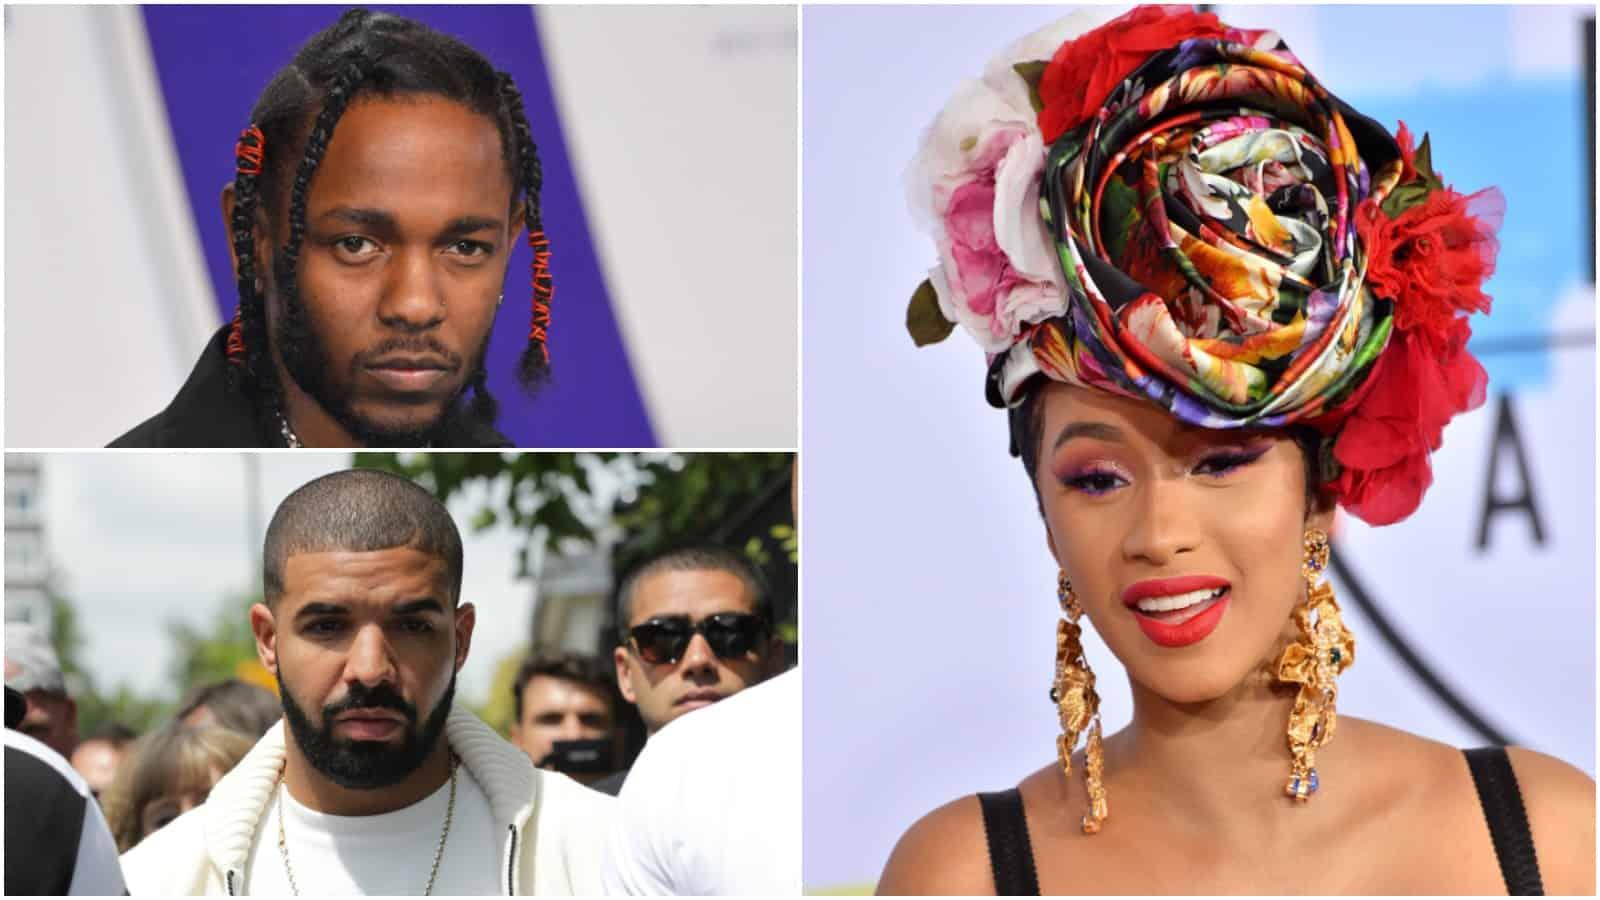 Kendrick Lamar, Drake, Cardi B Leads 2018 Grammy Nominations